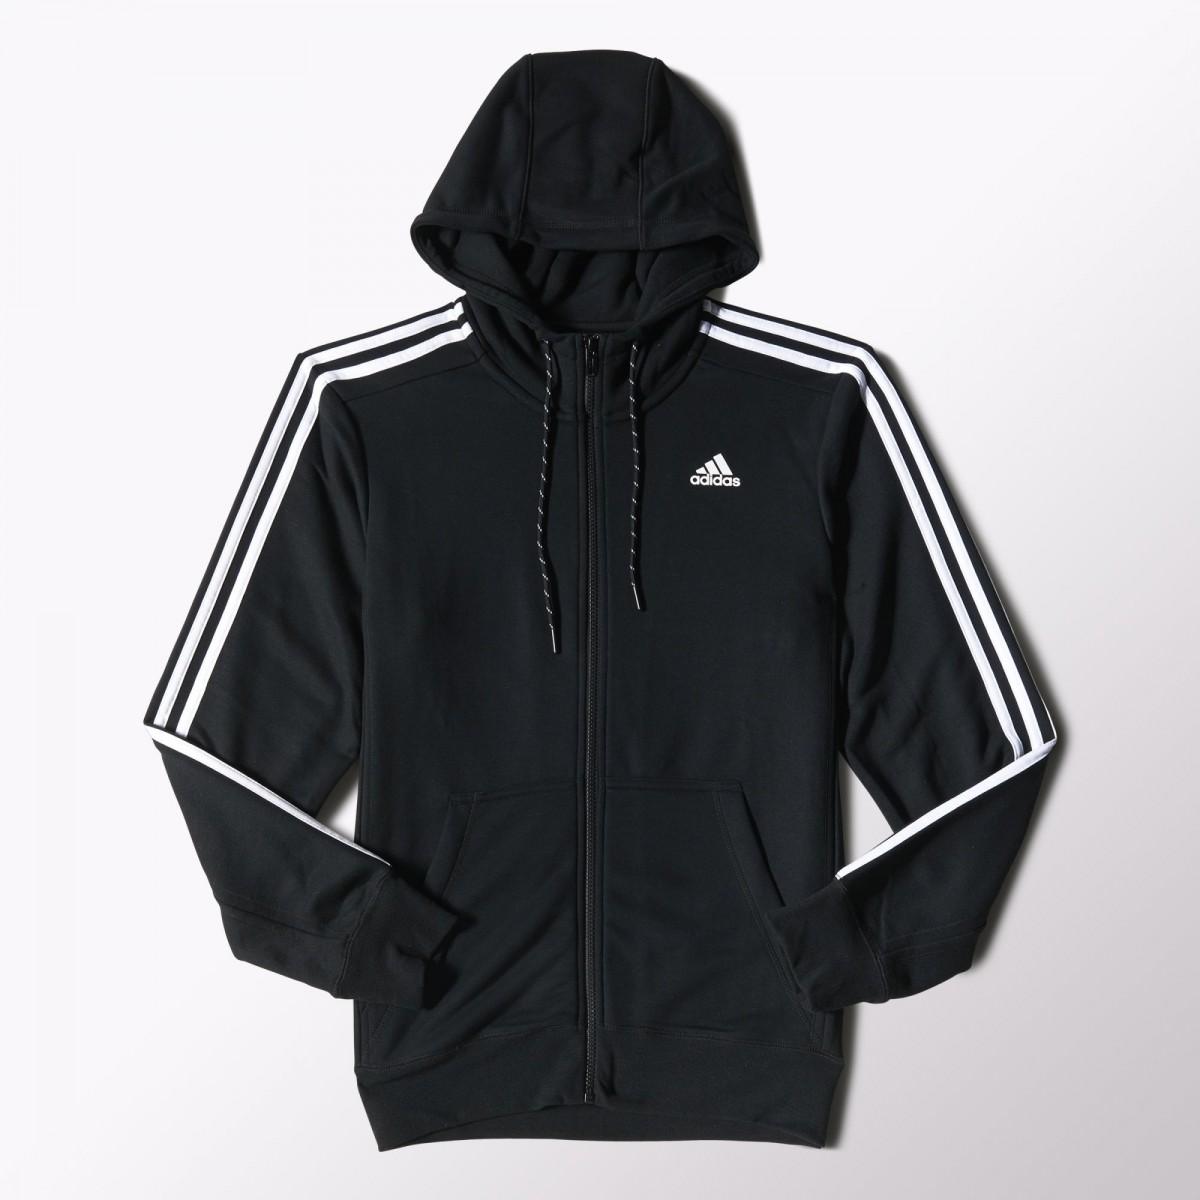 6f9eeb63869 Bizz Store - Jaqueta Masculina Adidas Ess The Hood Preta S88109